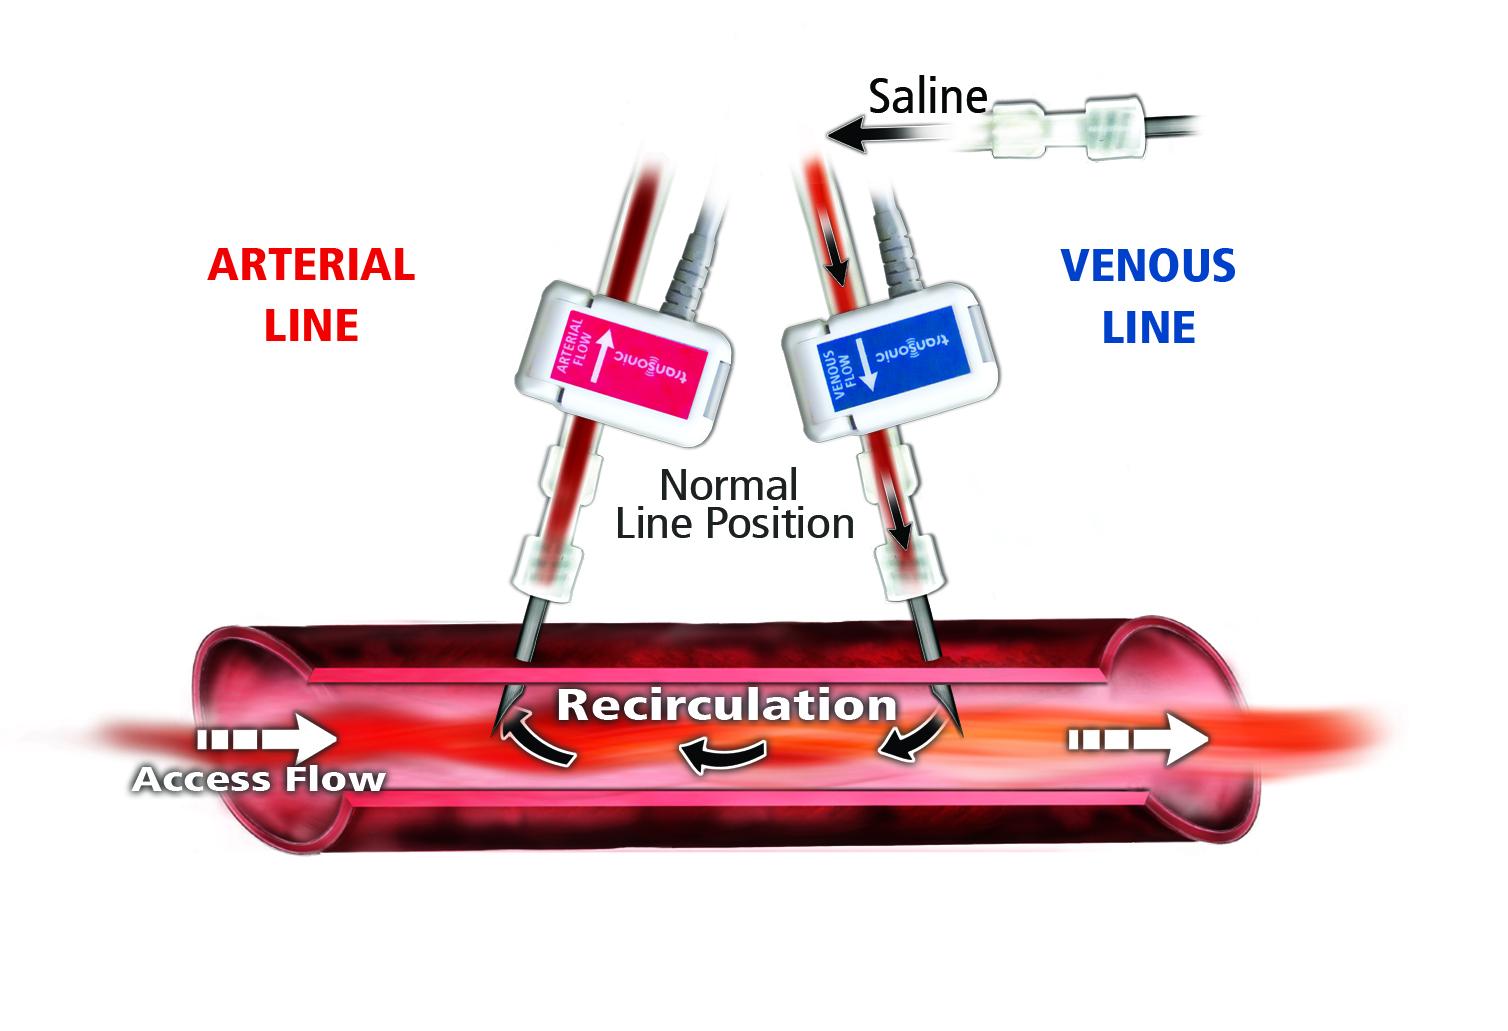 Vascular Access Recirculation